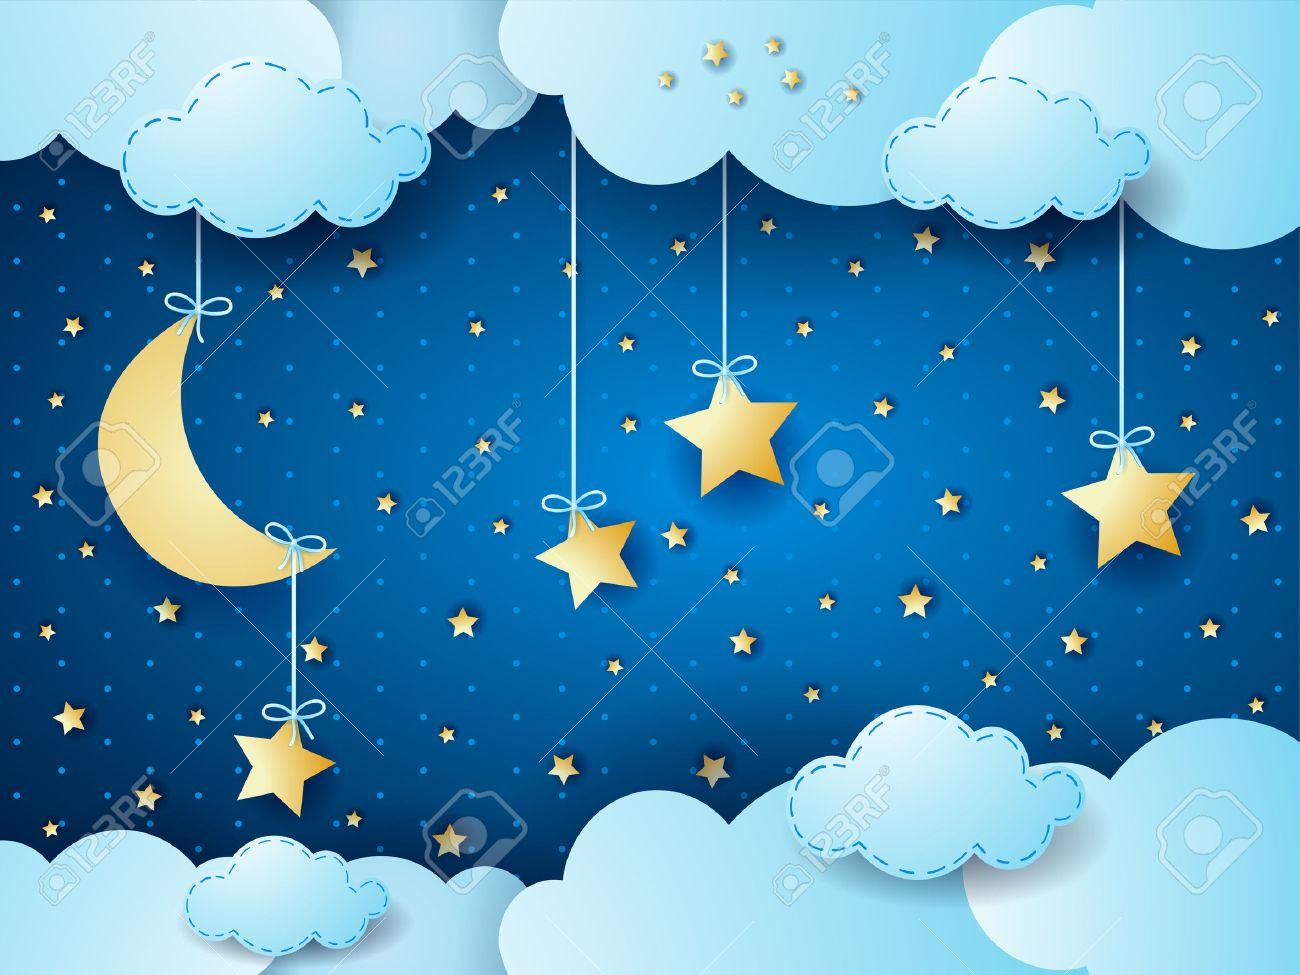 Surreal night, fantasy cloud scape. Vector illustration - 51043839